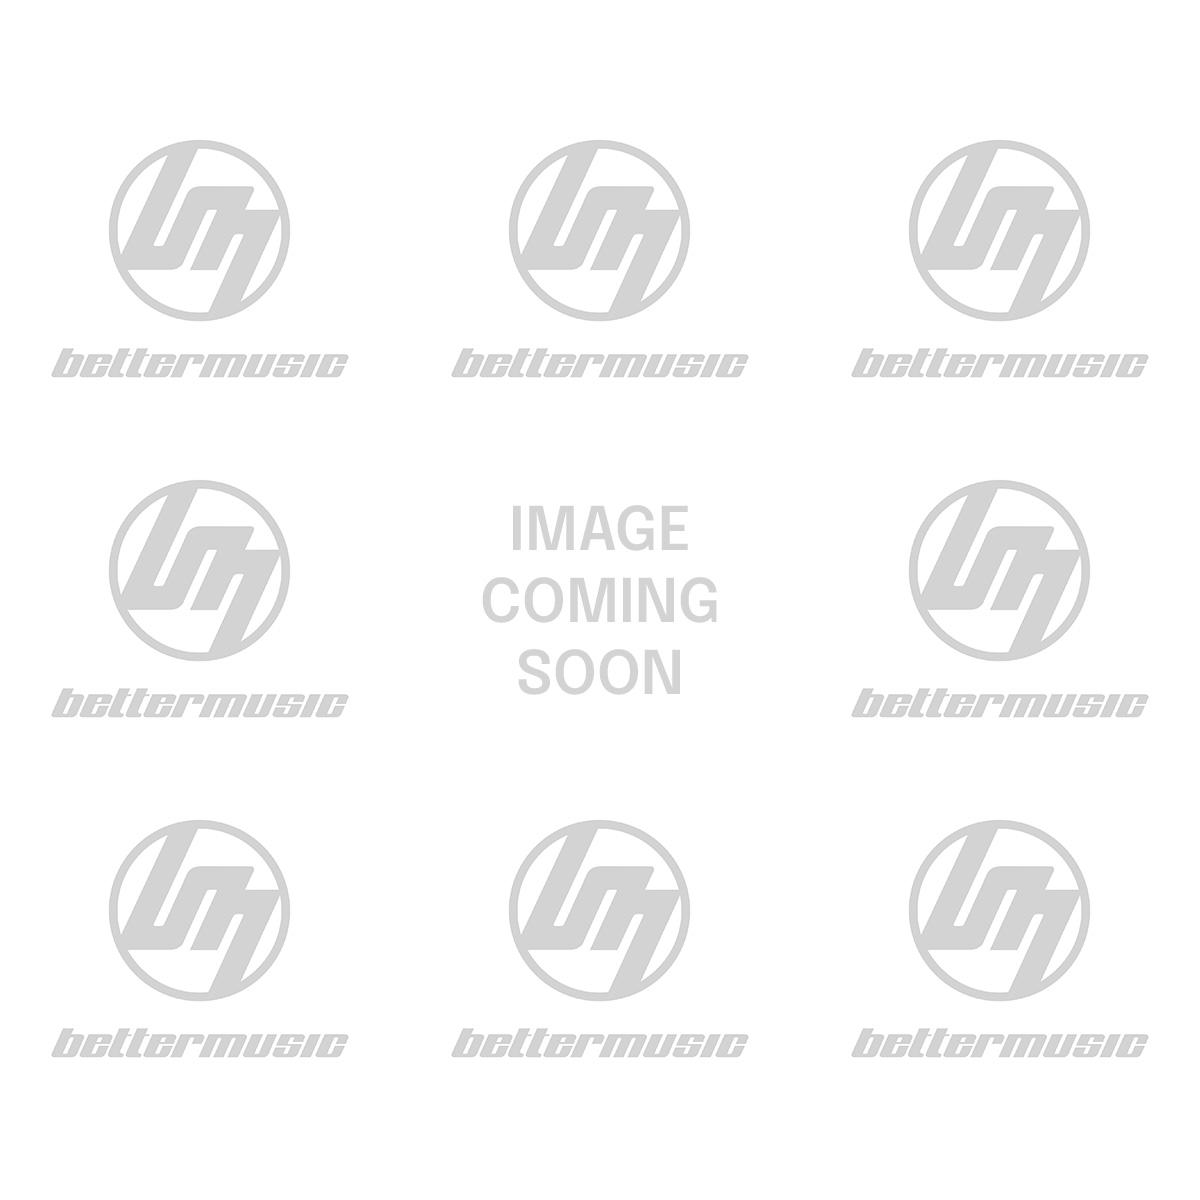 Roc-N-Soc Drum Throne - Nitro Rider w/ Original BLUE seat (NROB)